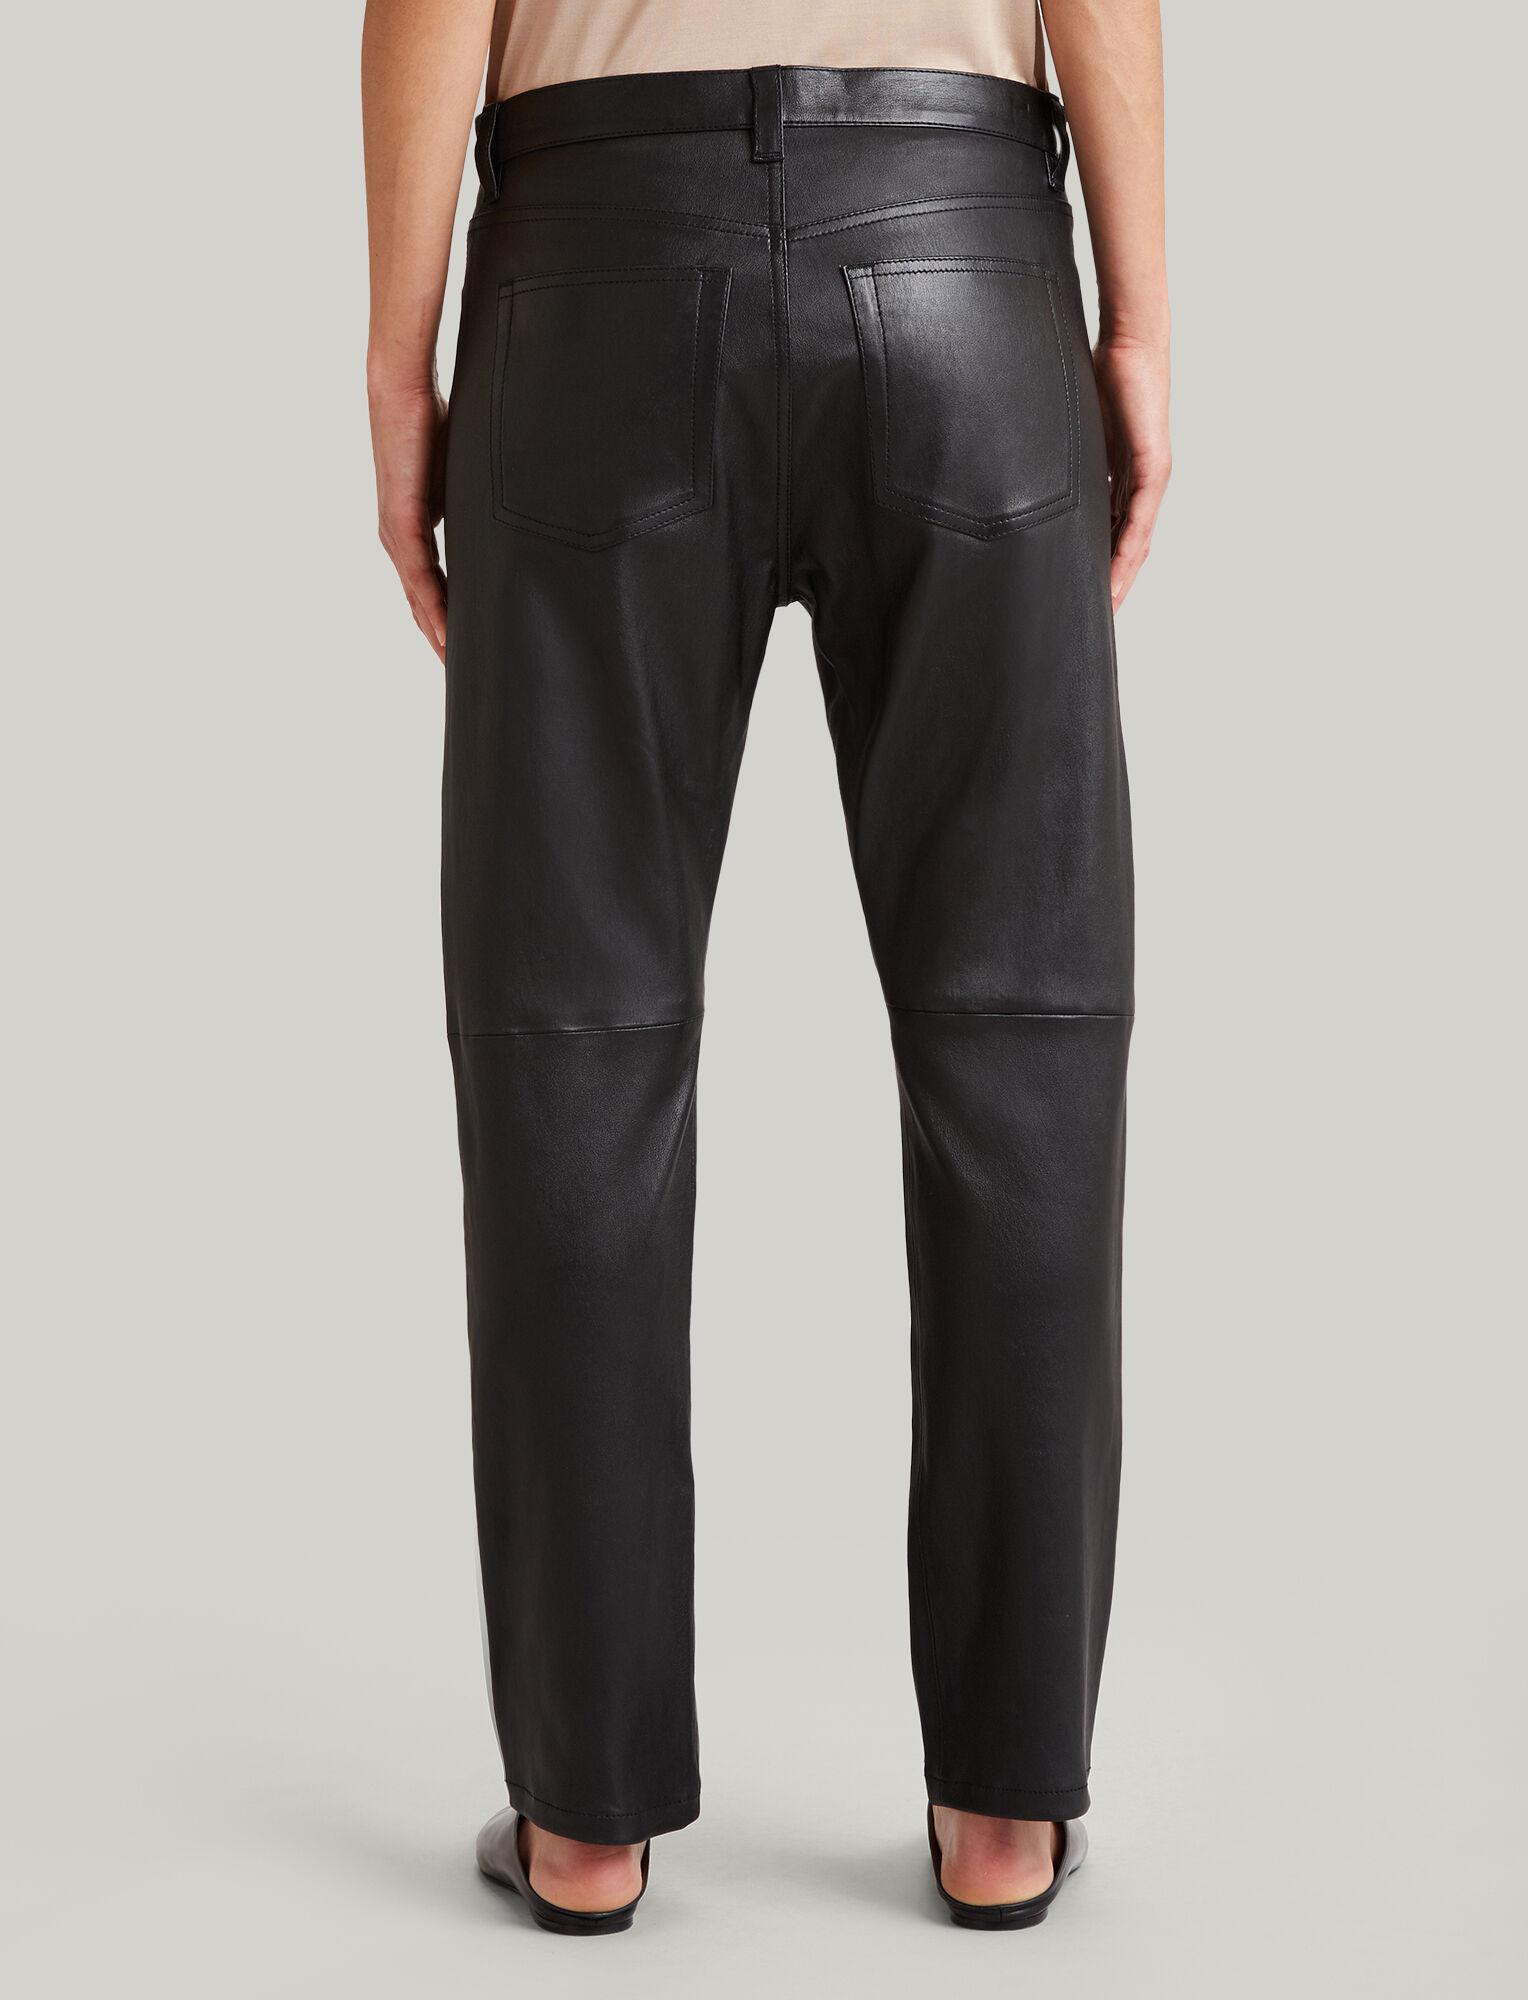 Joseph, Kemp Stretch Leather Trousers, in BLACK